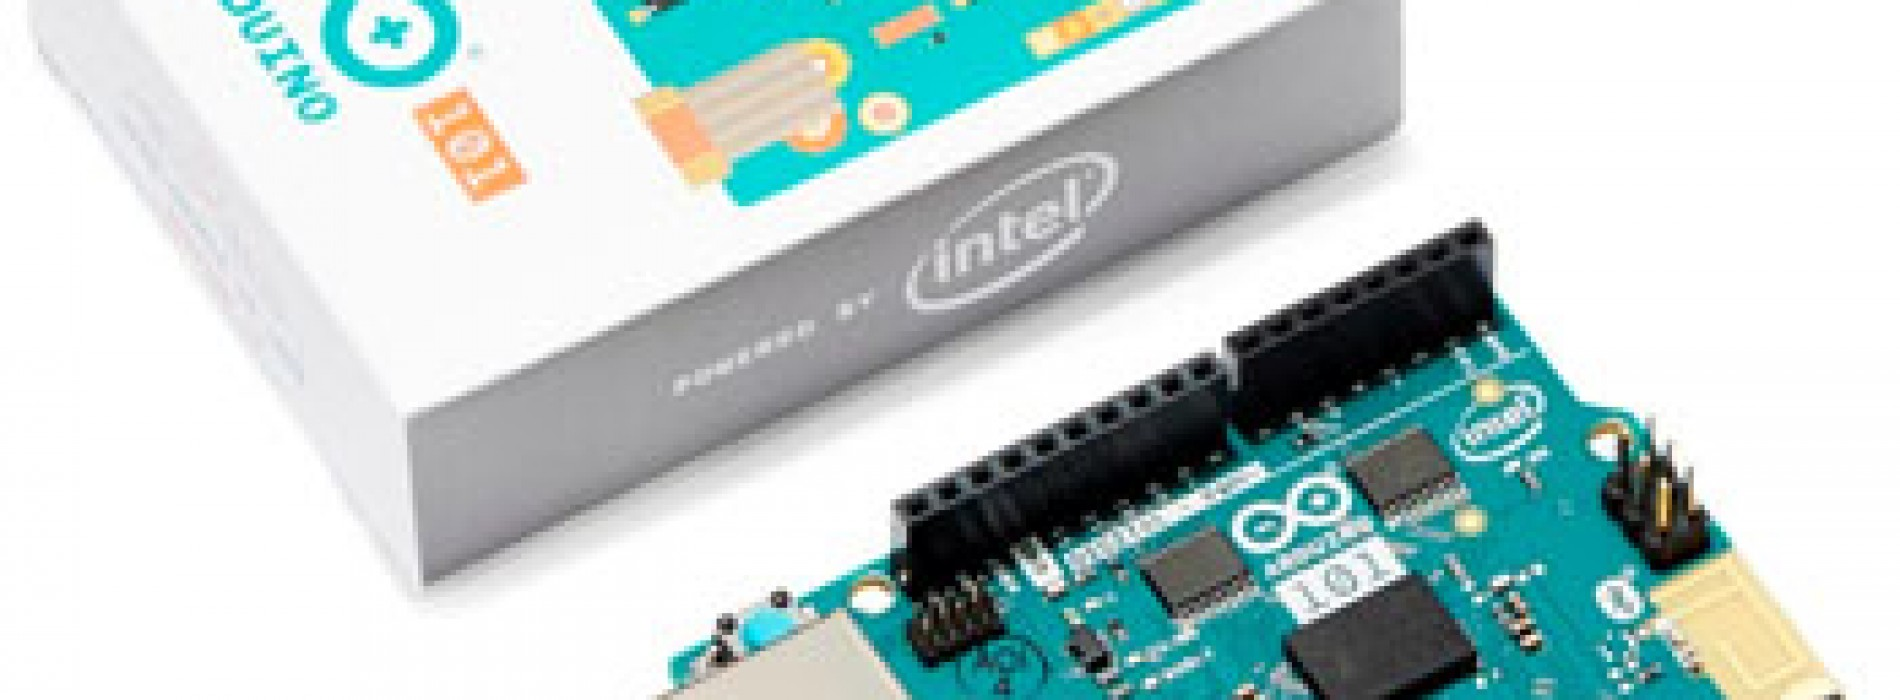 Placa de desarrollo conectada a programa educacional para enseñar  tecnología